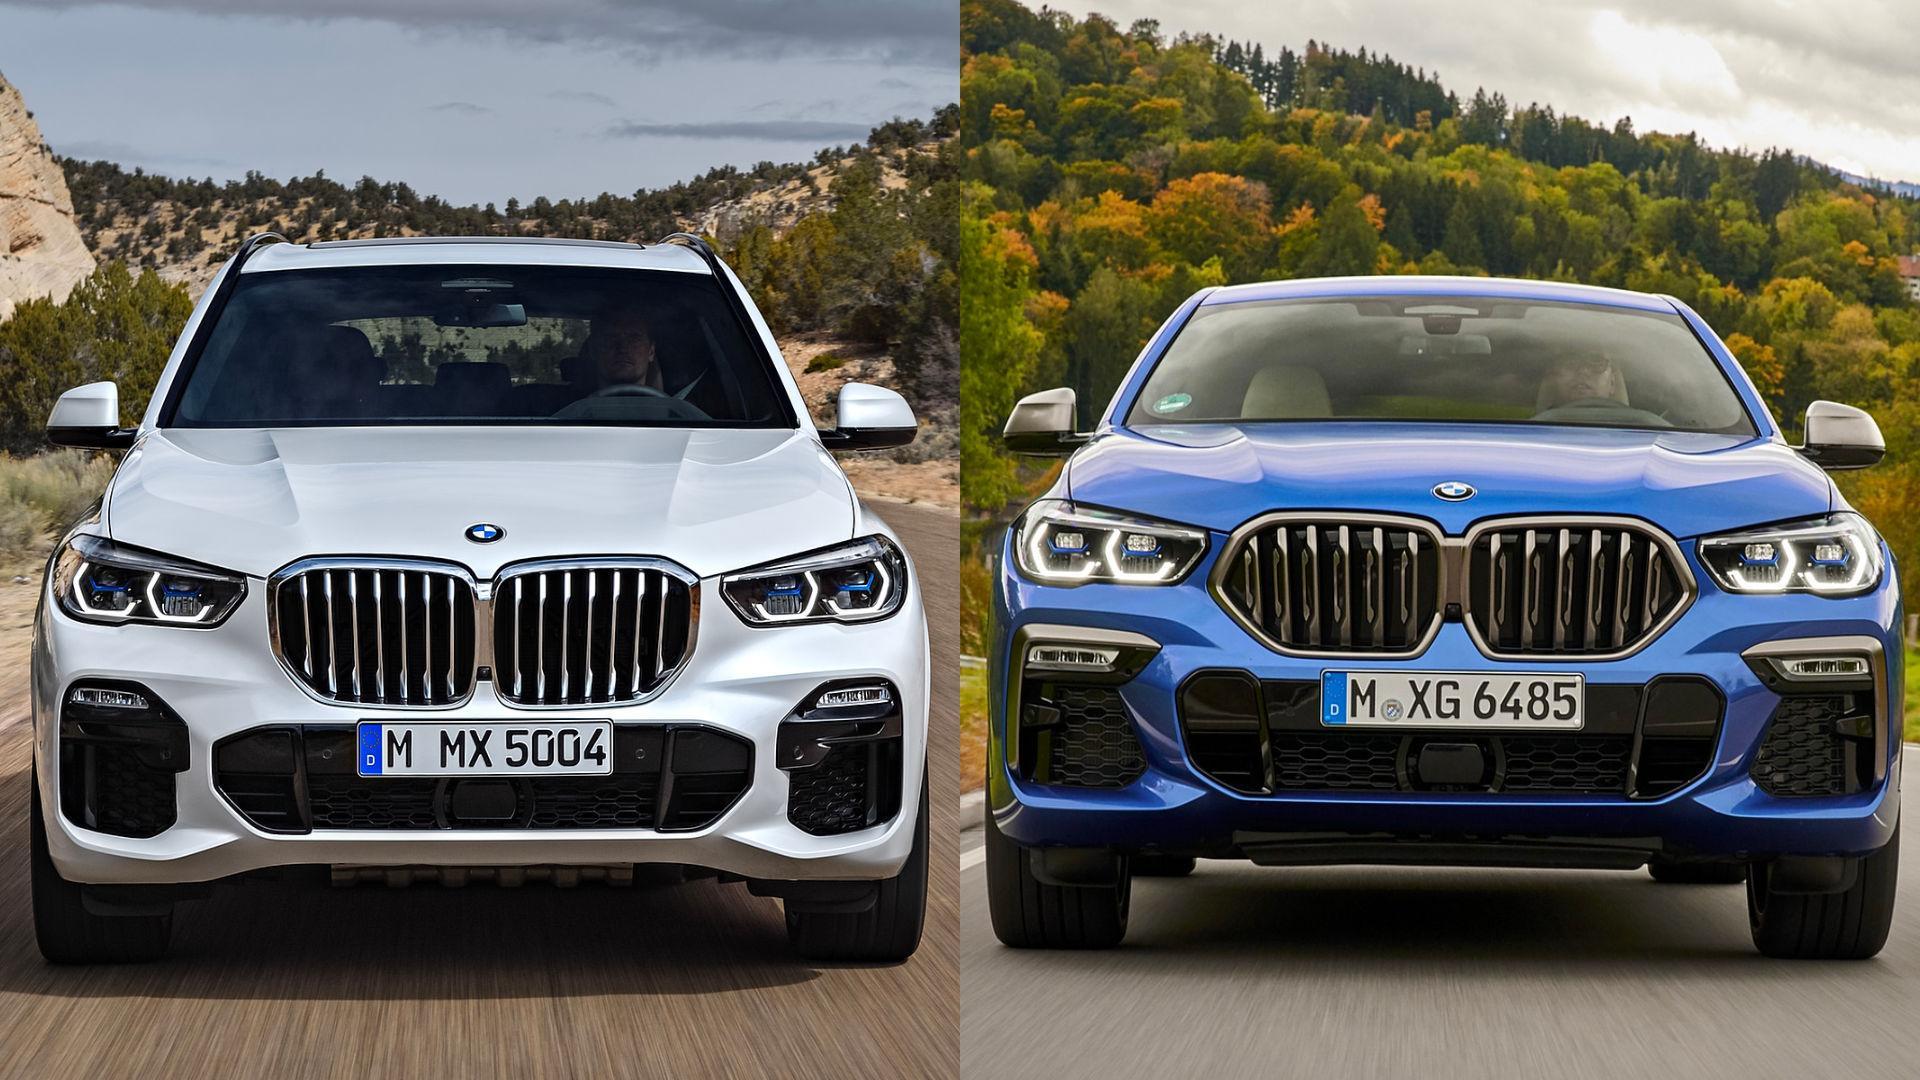 BMW X5 vs X6